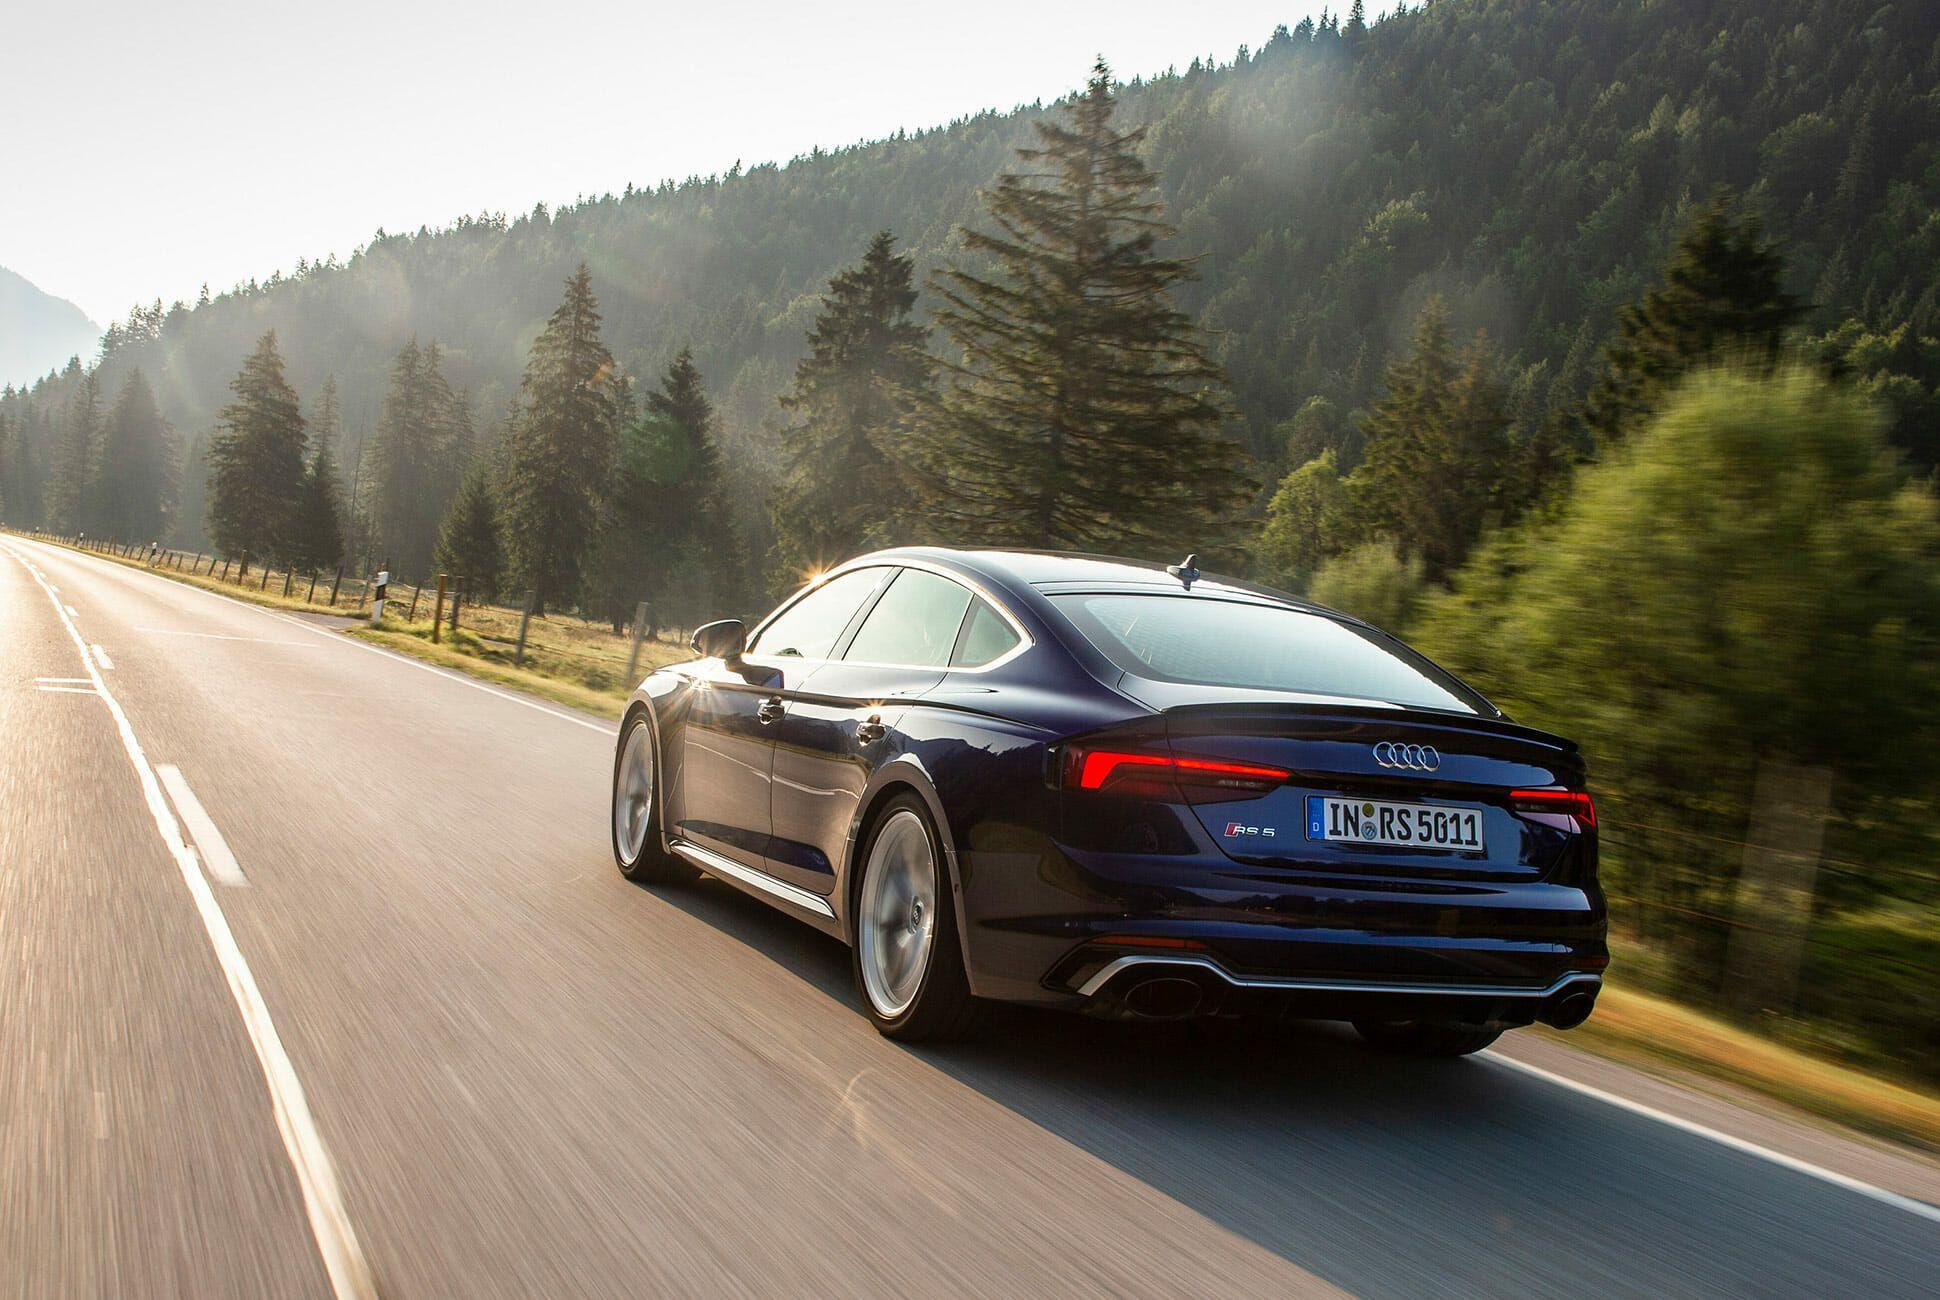 Audi-RS5-Sportback-Review-gear-patrol-slide-5